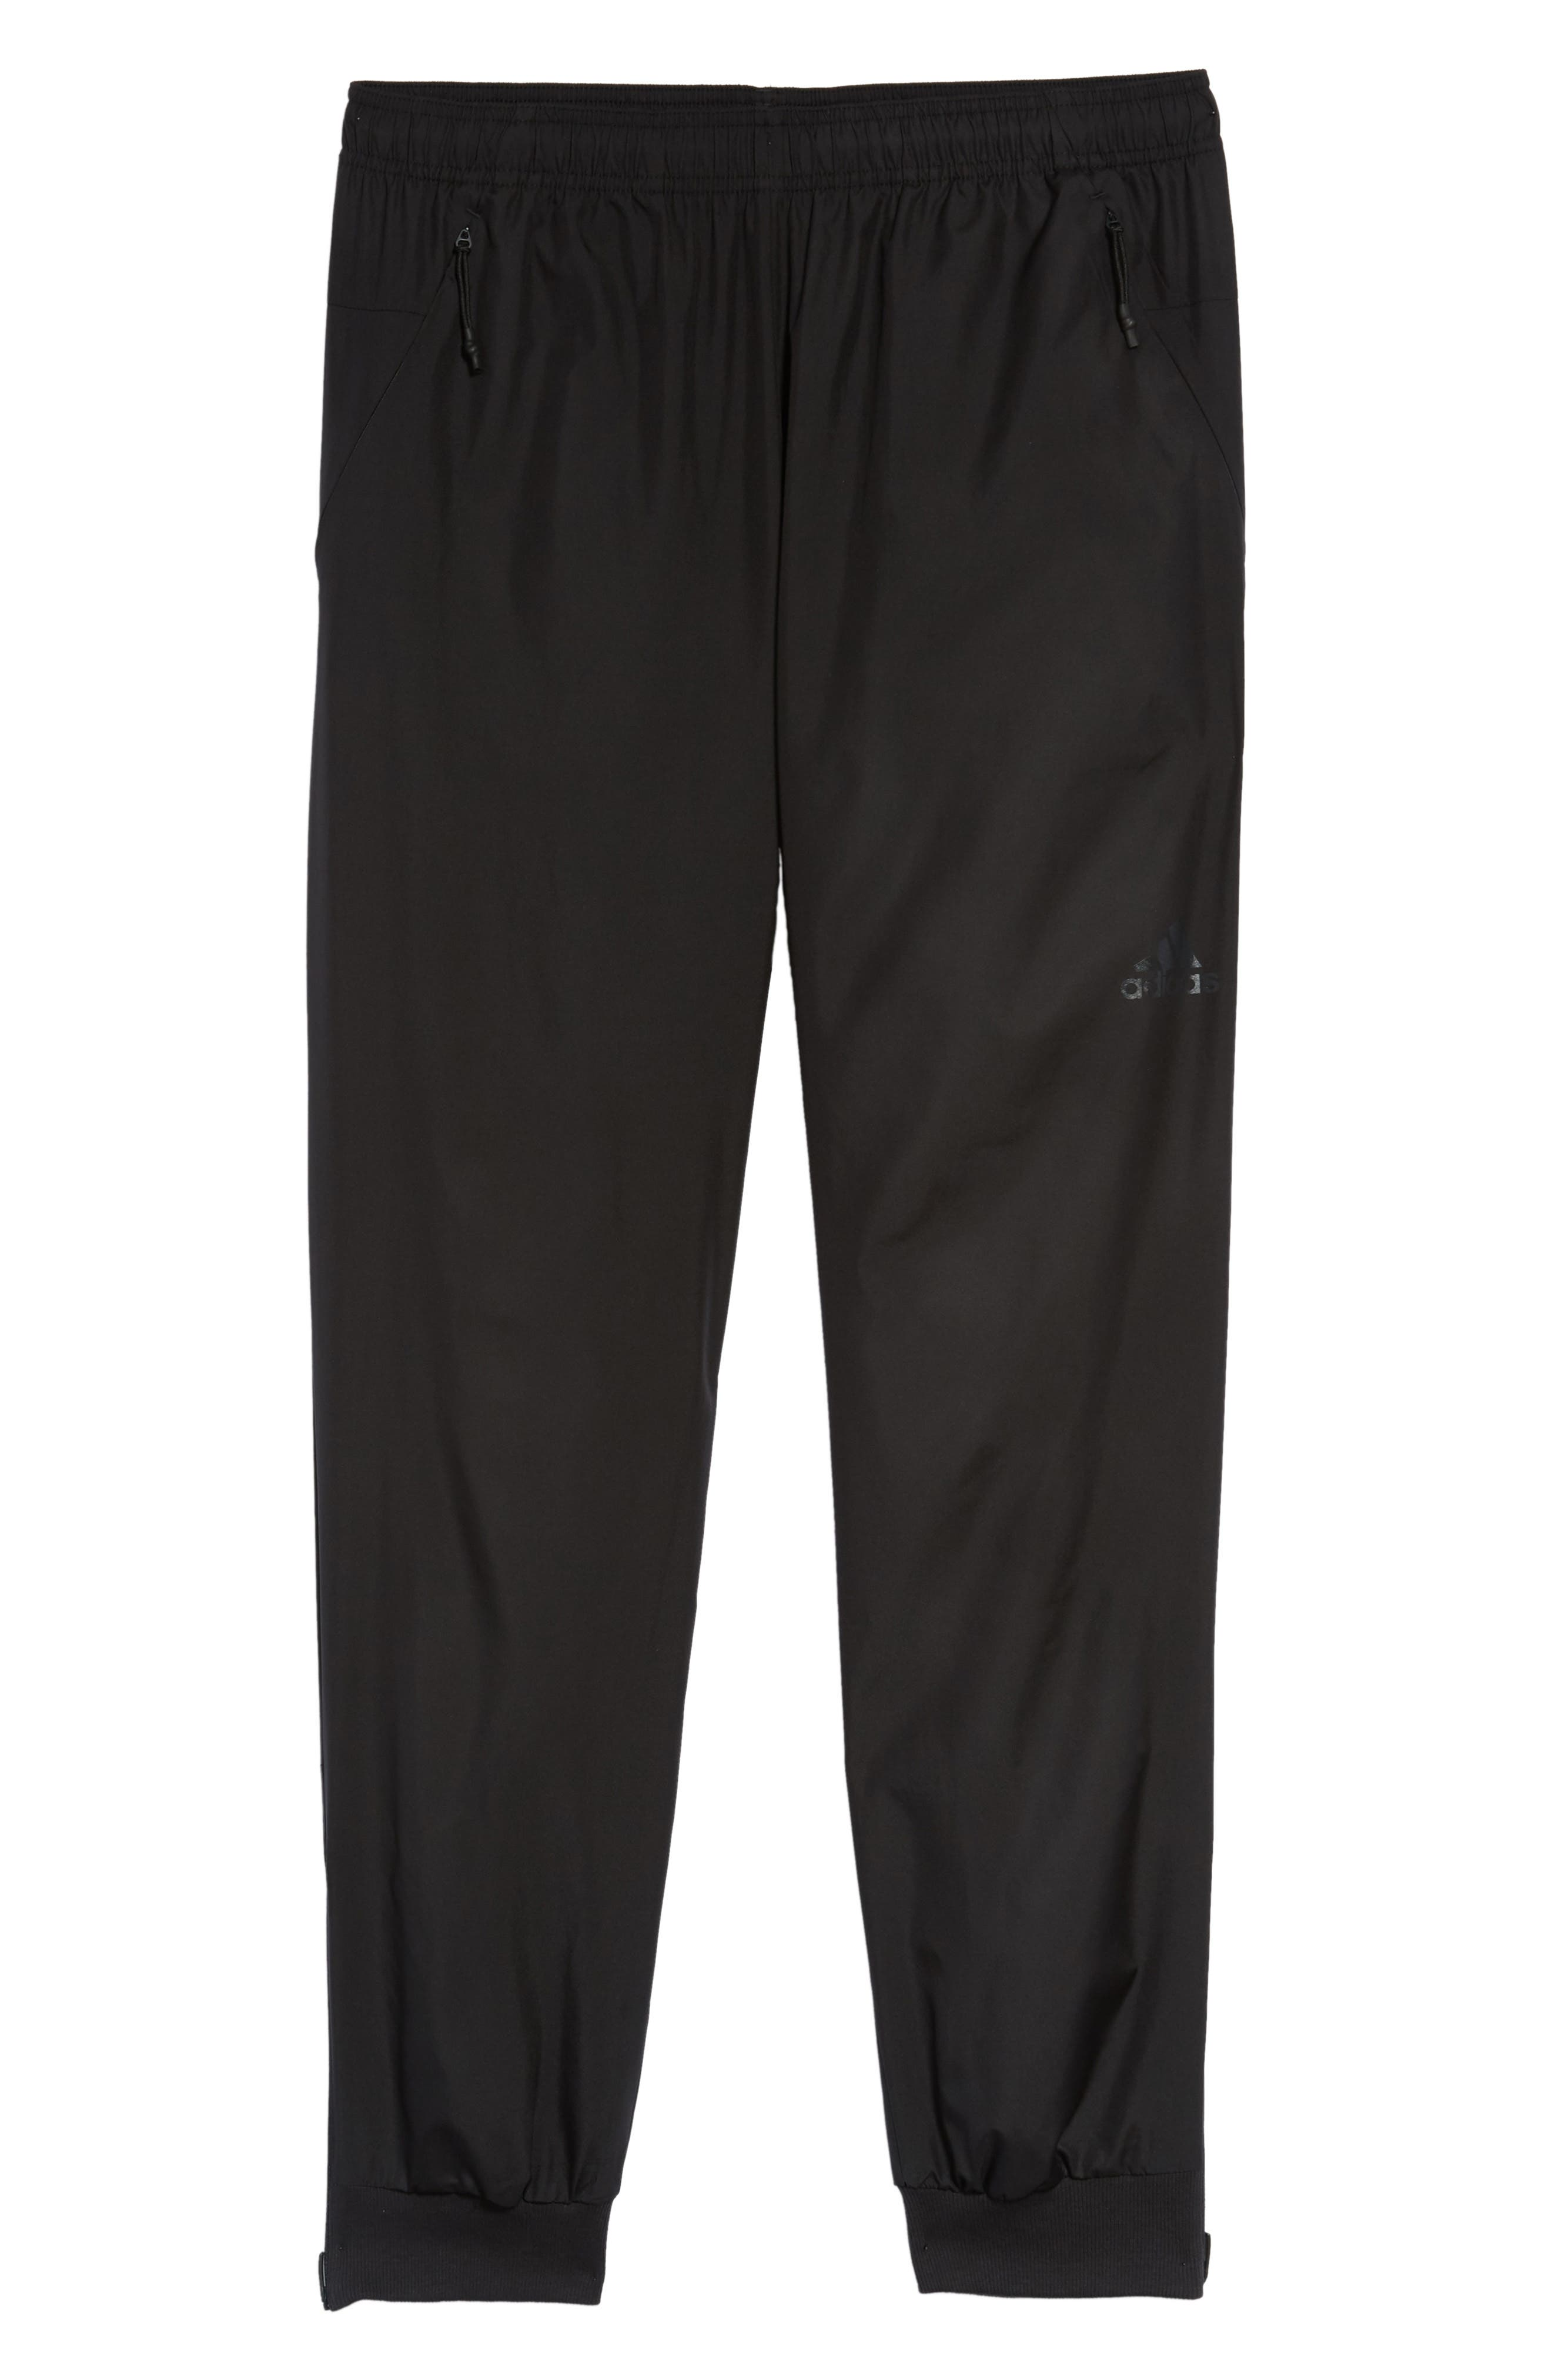 Slim Fit Sweatpants,                             Alternate thumbnail 6, color,                             BLACK